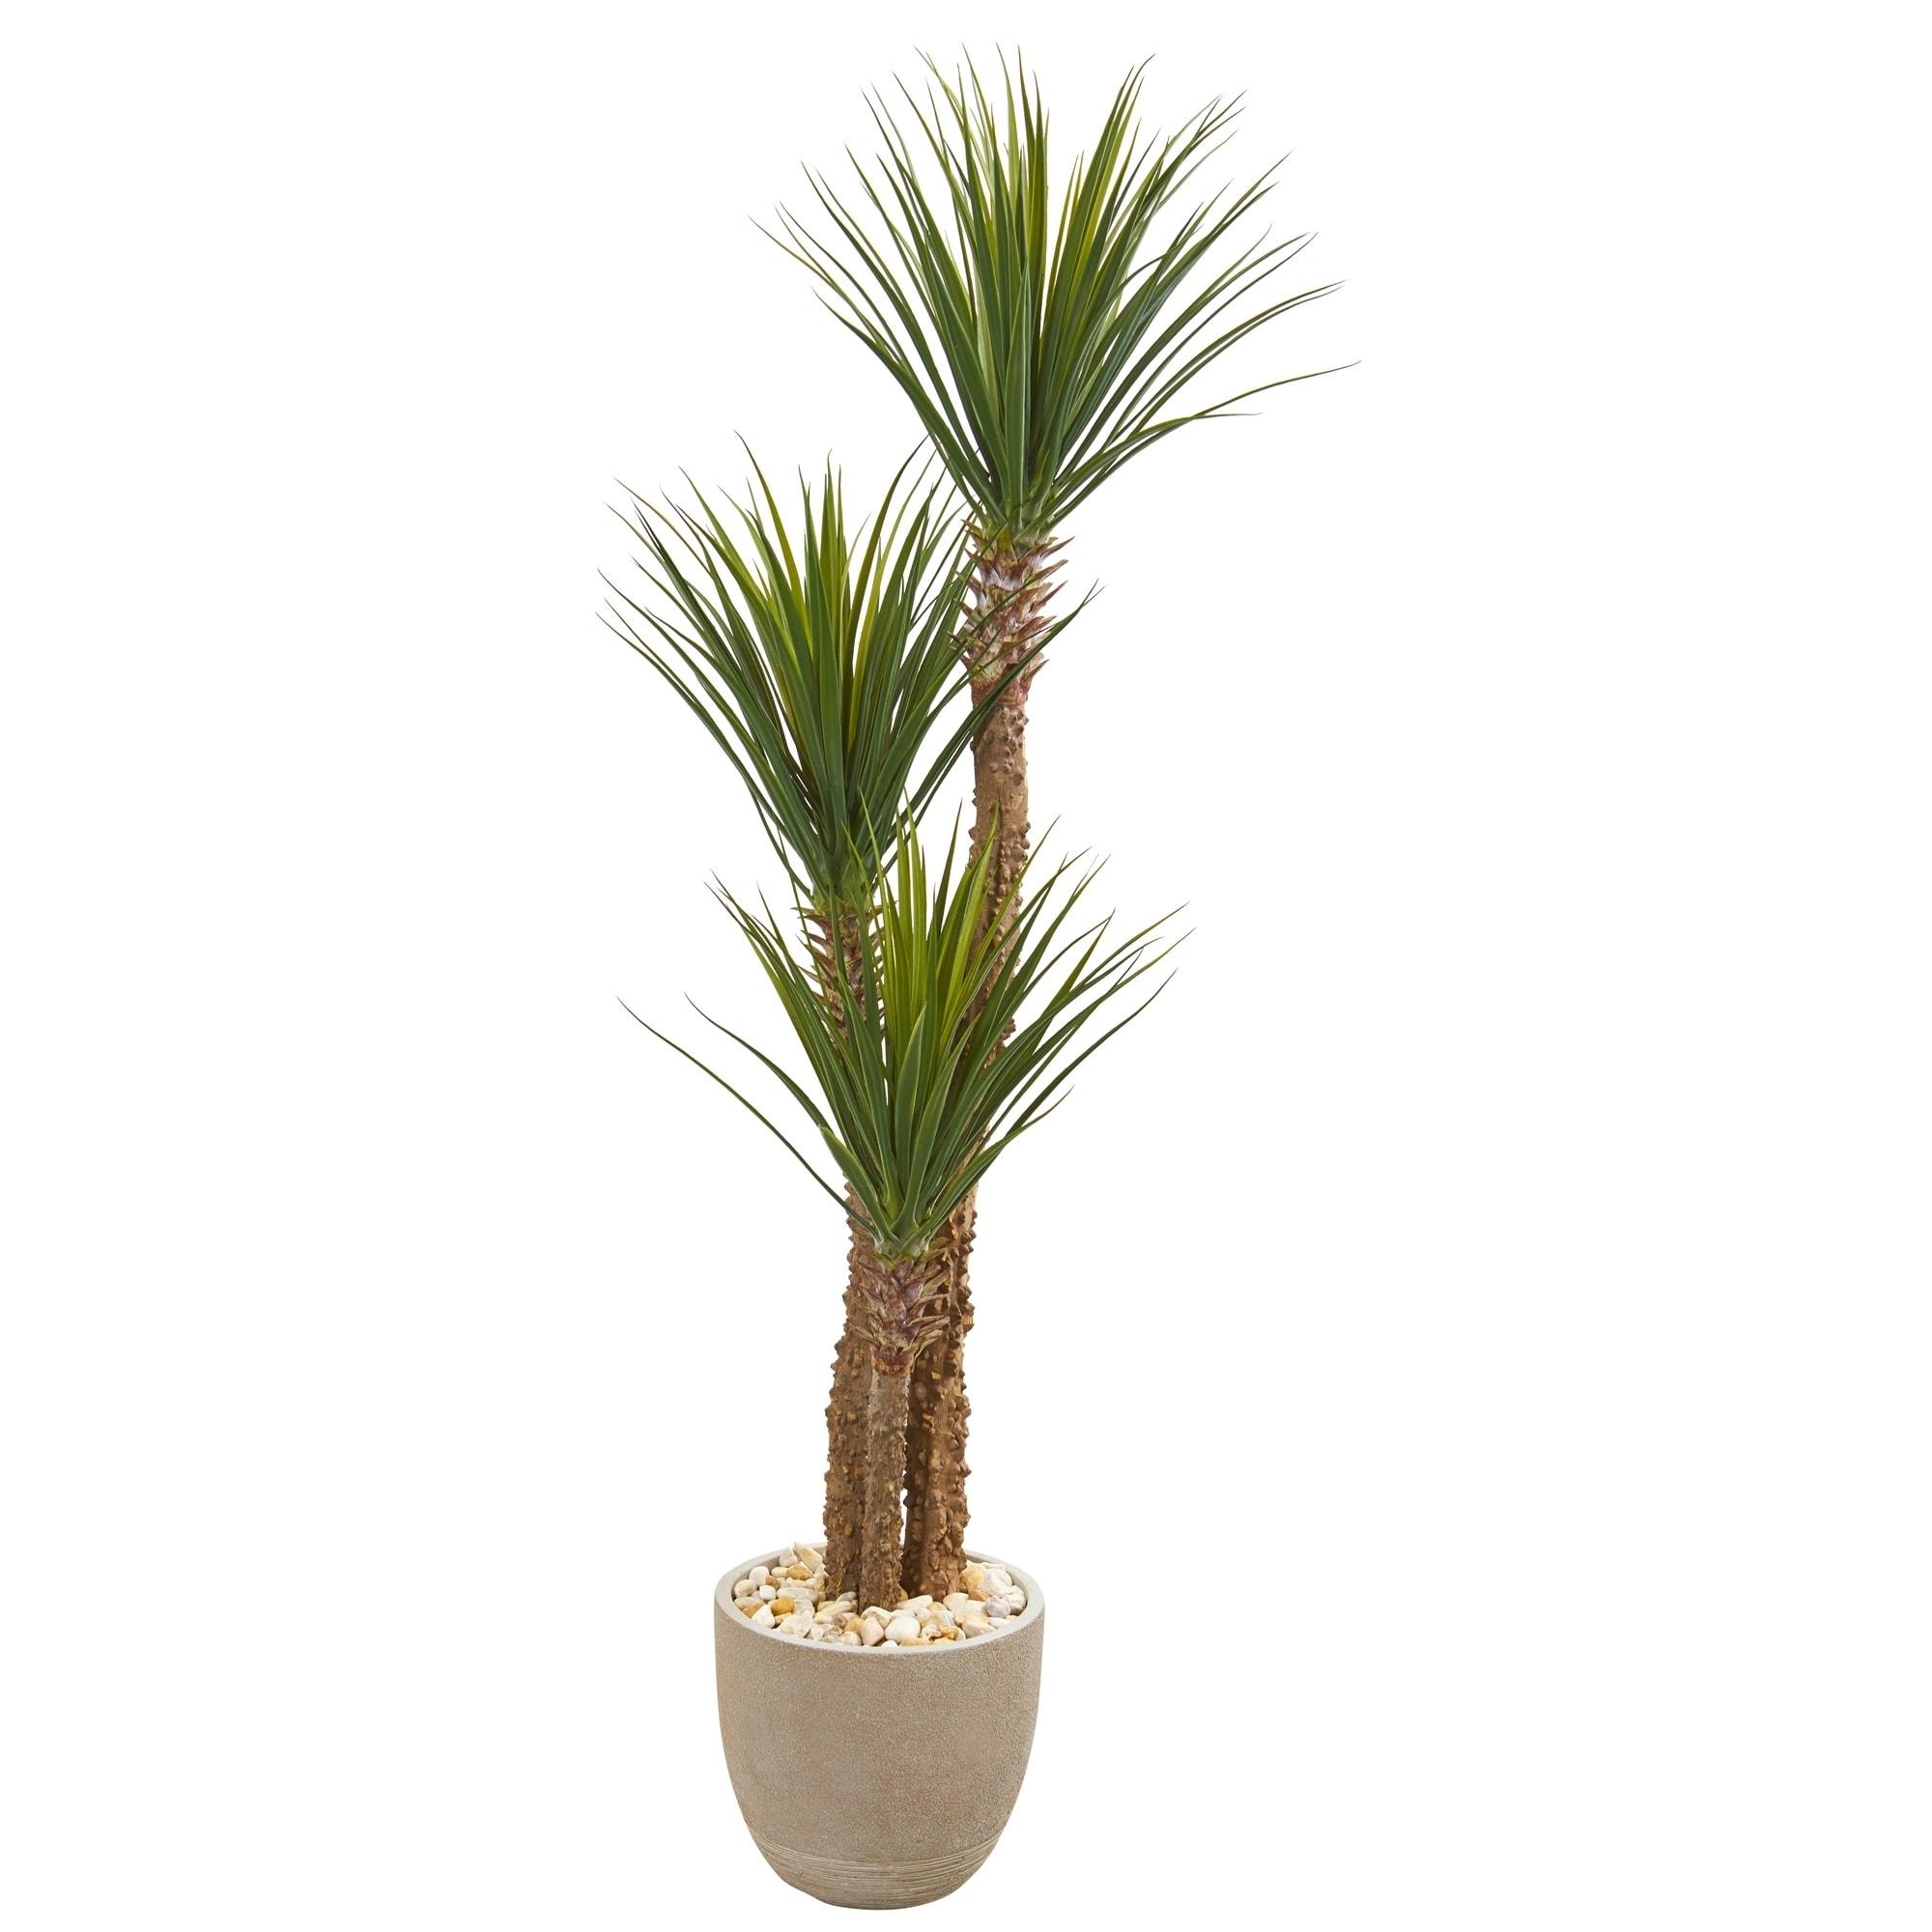 63 Yucca Artificial Tree in Sandstone Planter